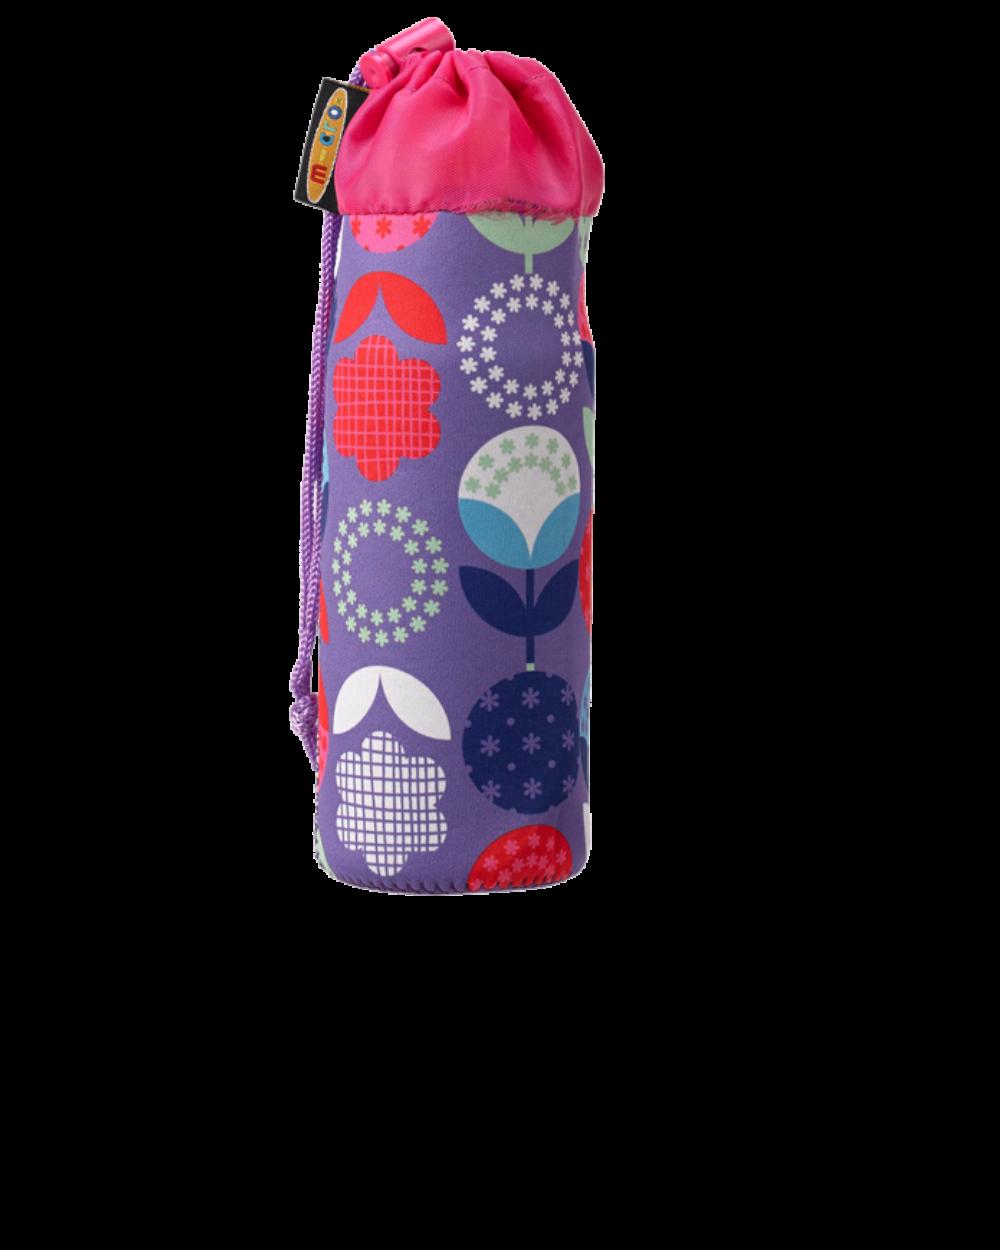 Micro roller kulacstartó, lila virágokkal